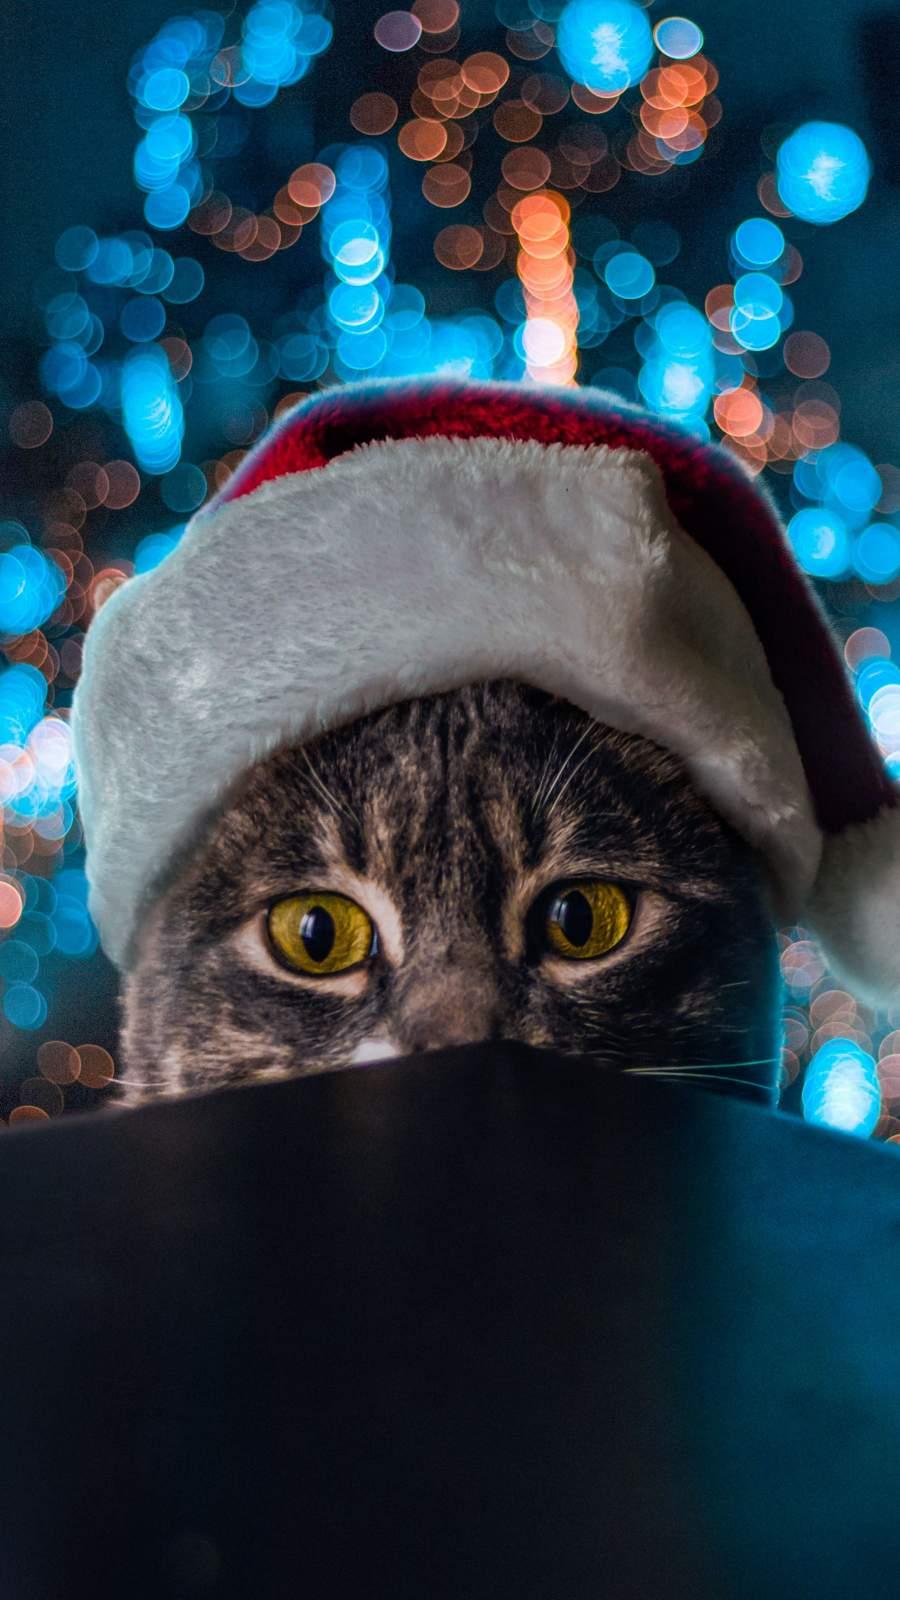 Cat Christmas iPhone Wallpaper